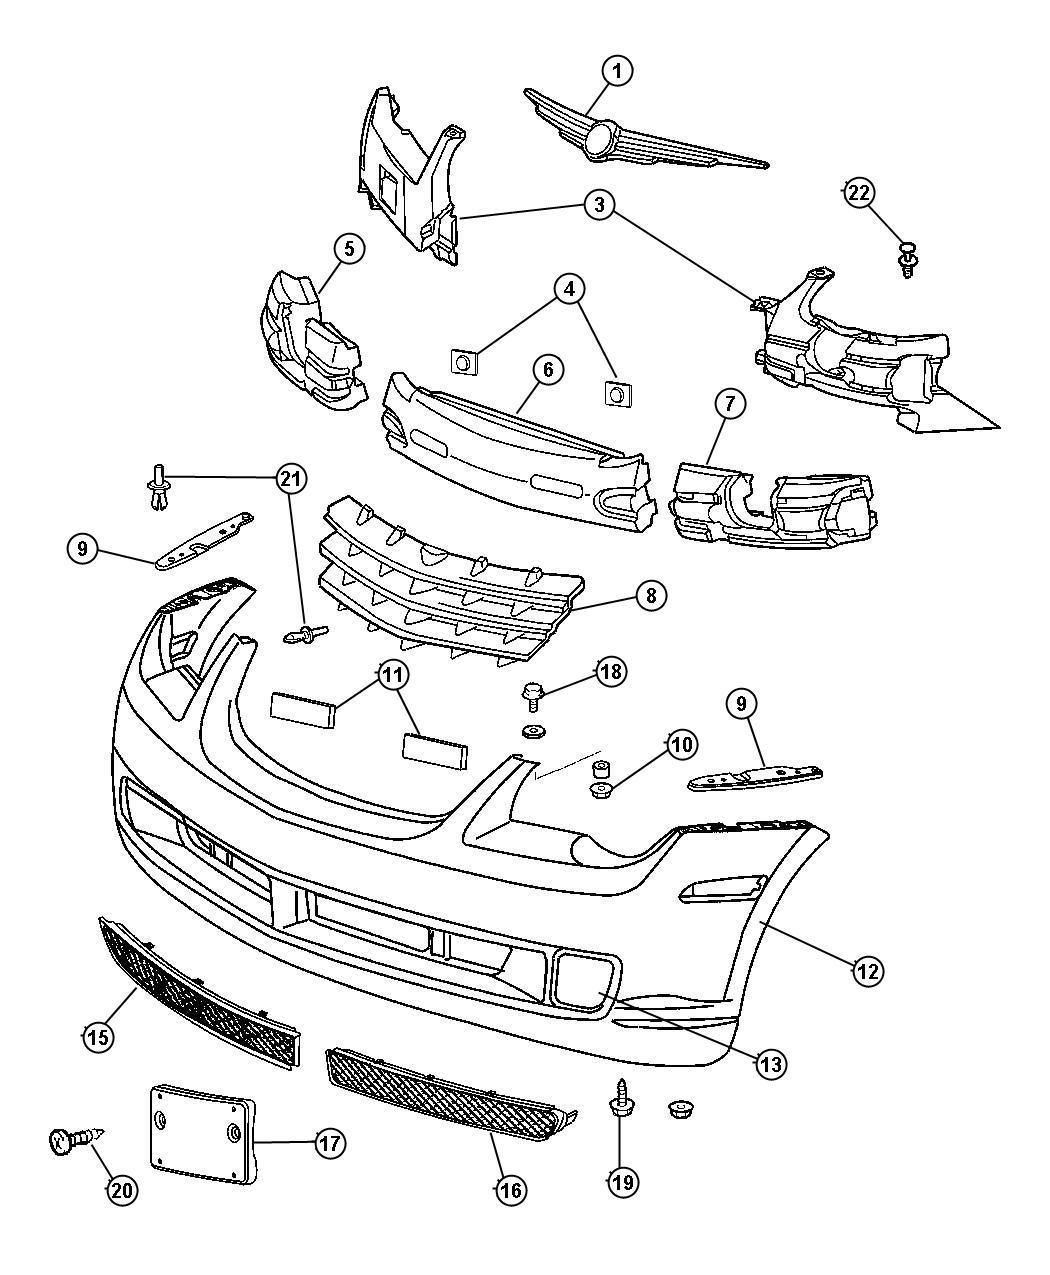 2008 chrysler crossfire repair kit market canada build. Black Bedroom Furniture Sets. Home Design Ideas